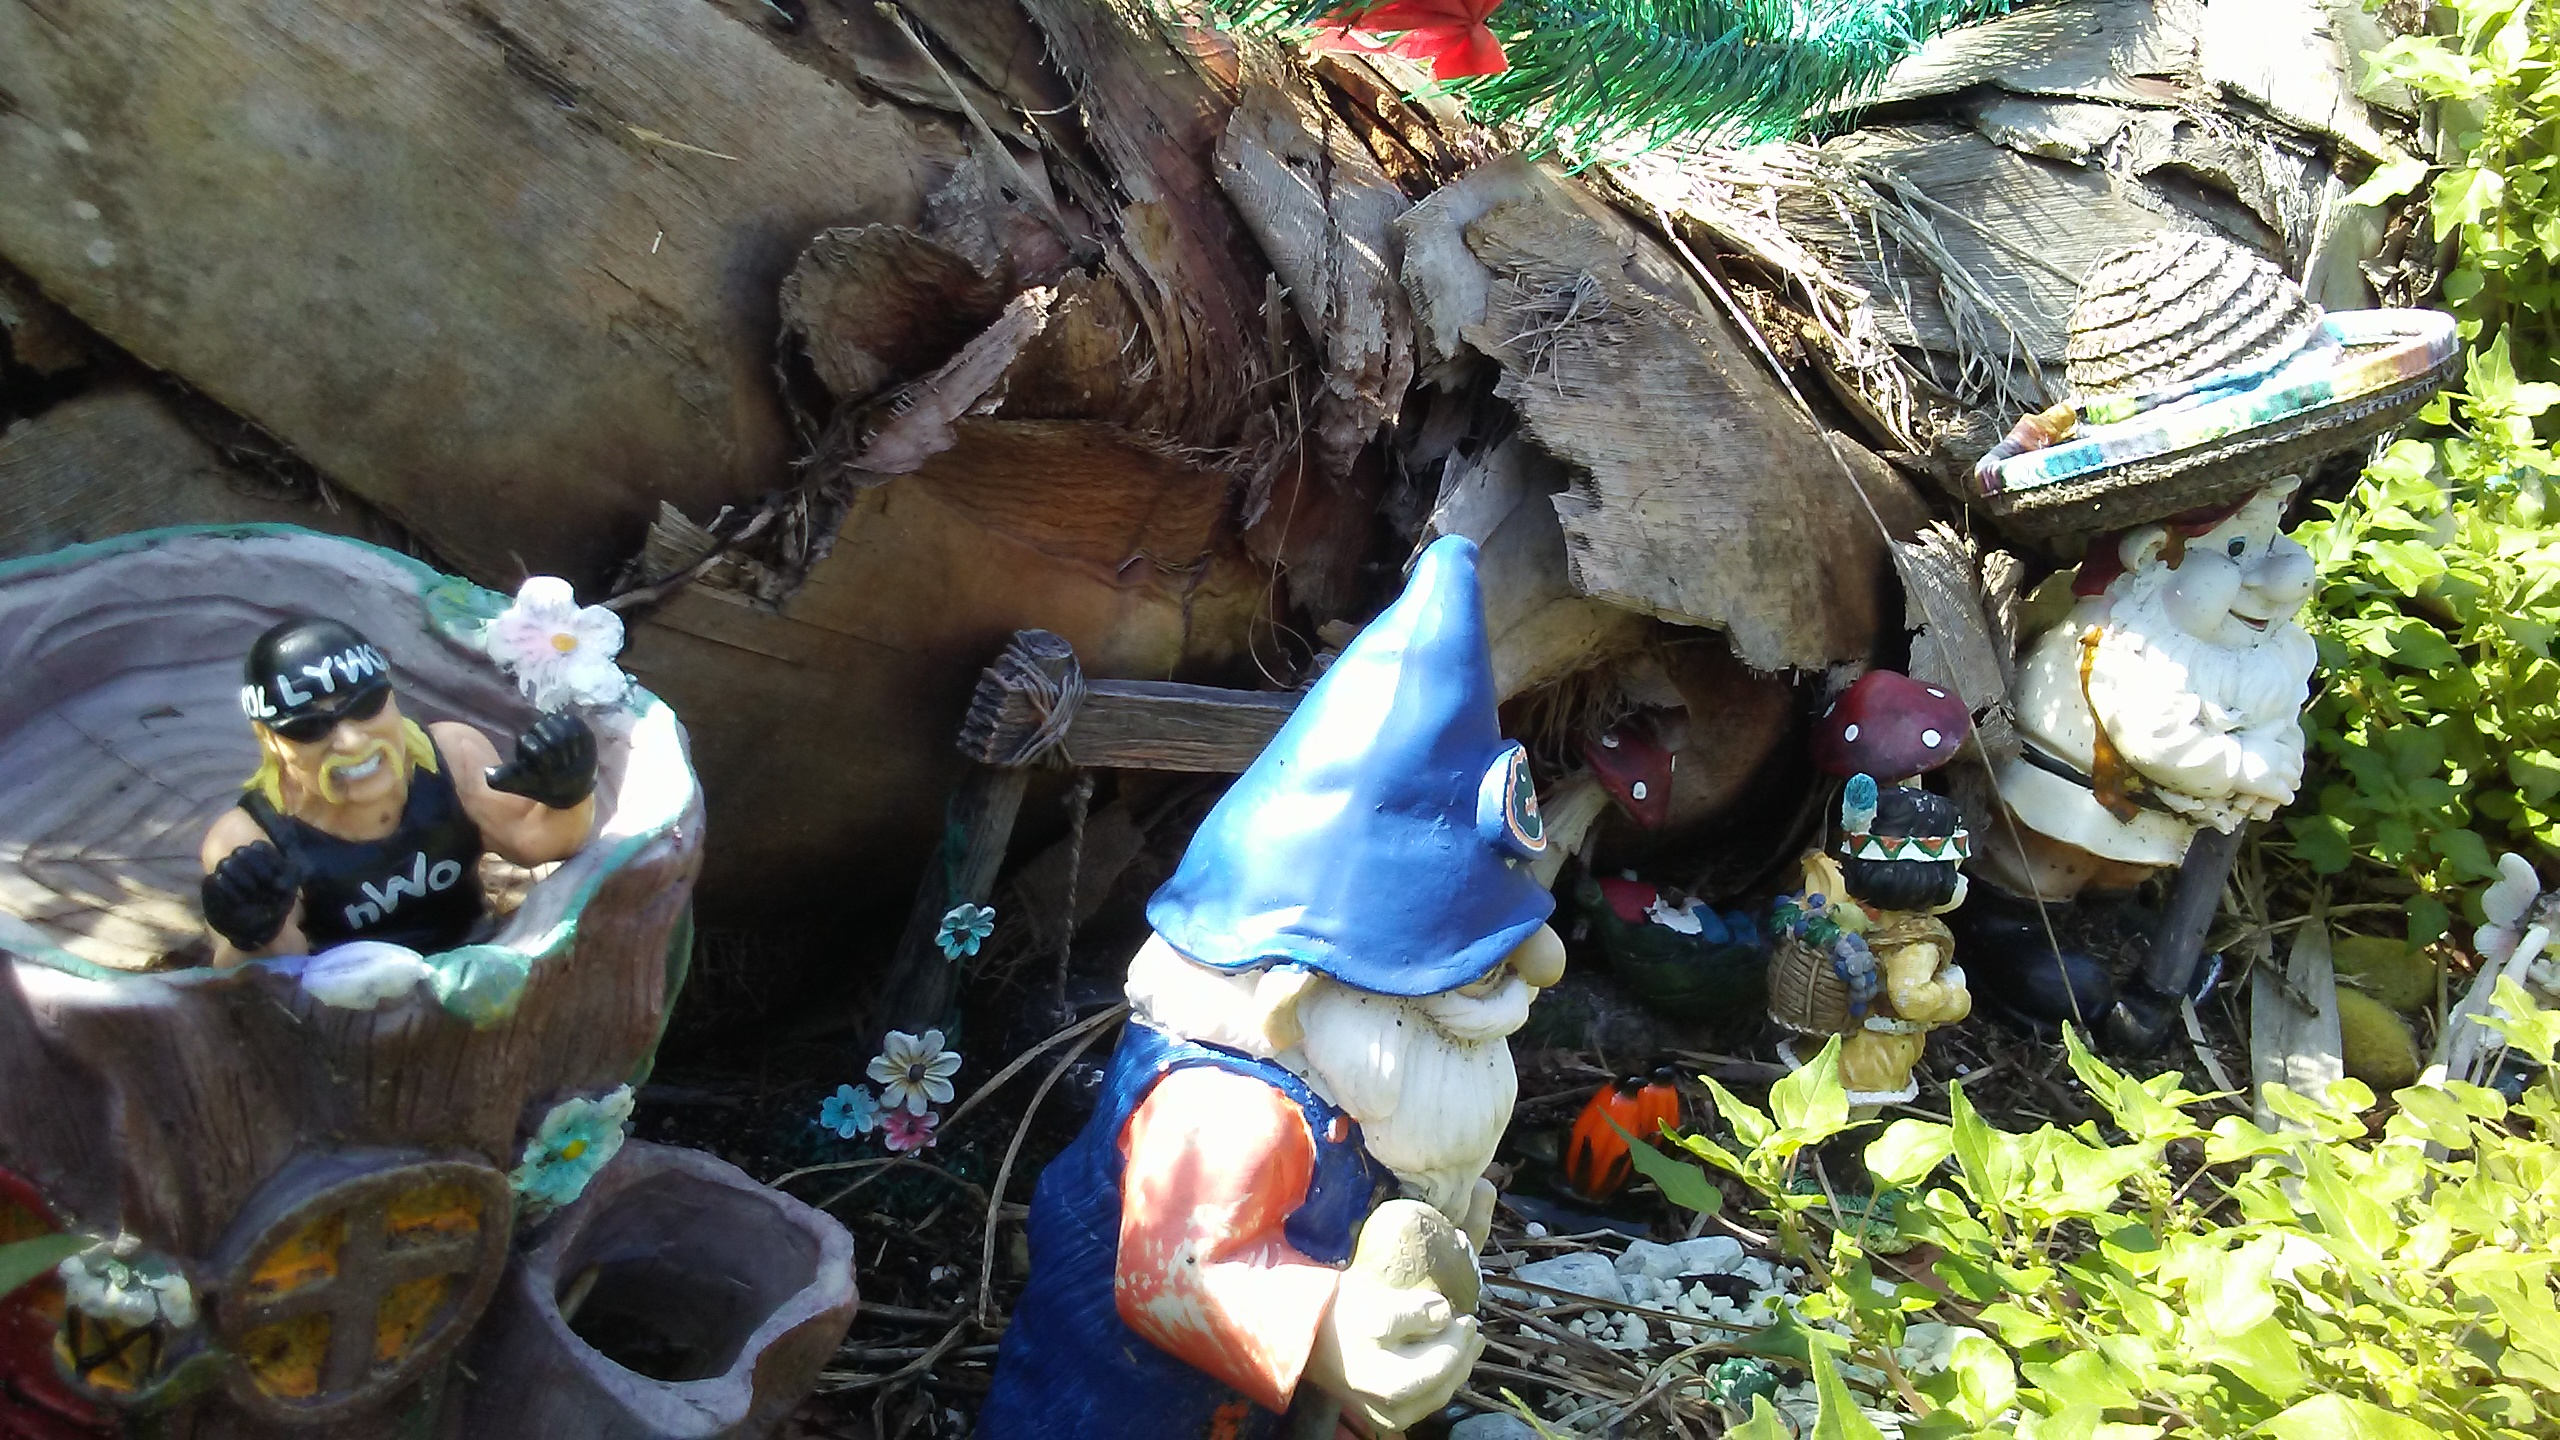 20190202_133354-jpg.48846_Gnome Village......!_Travel Stories_Squat the Planet_12:14 PM